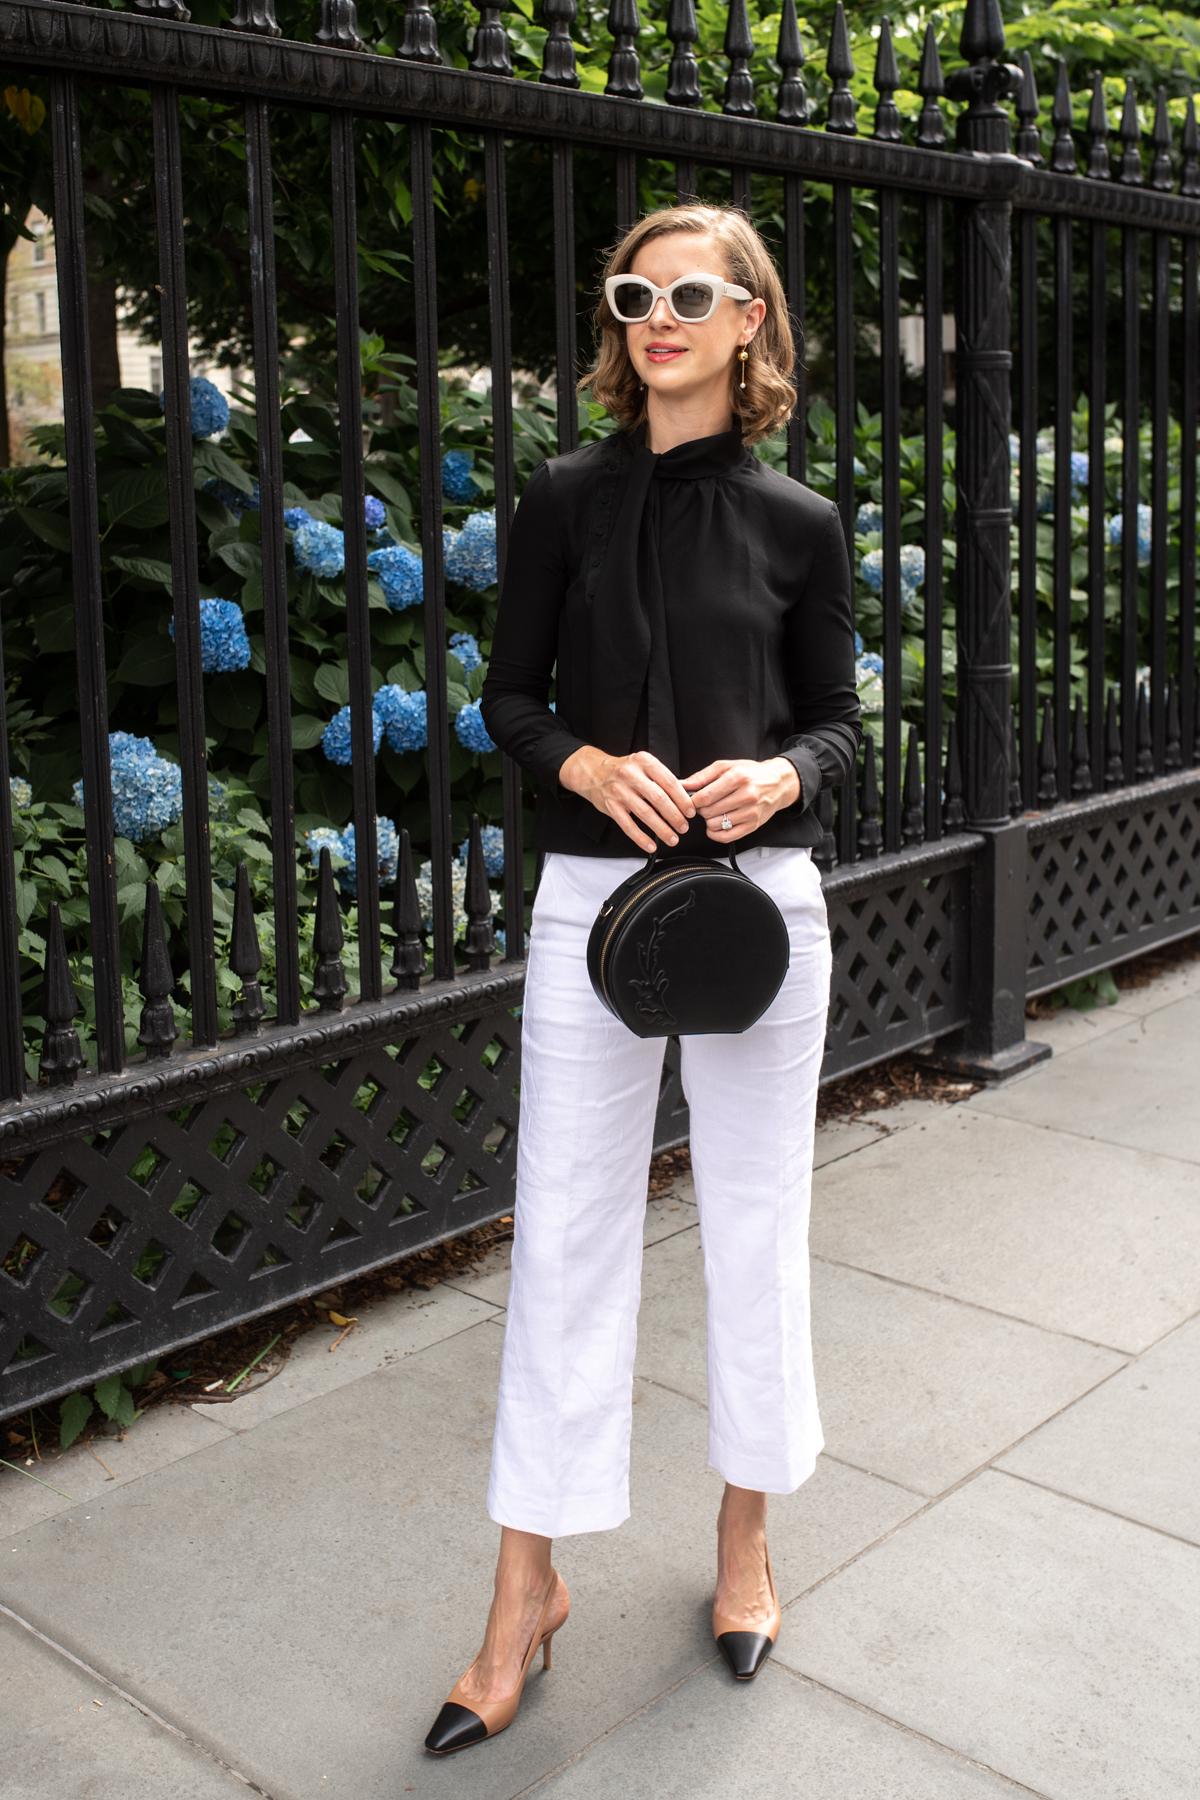 Stacie Flinner x Tell No Leyes Bag-2.jpg